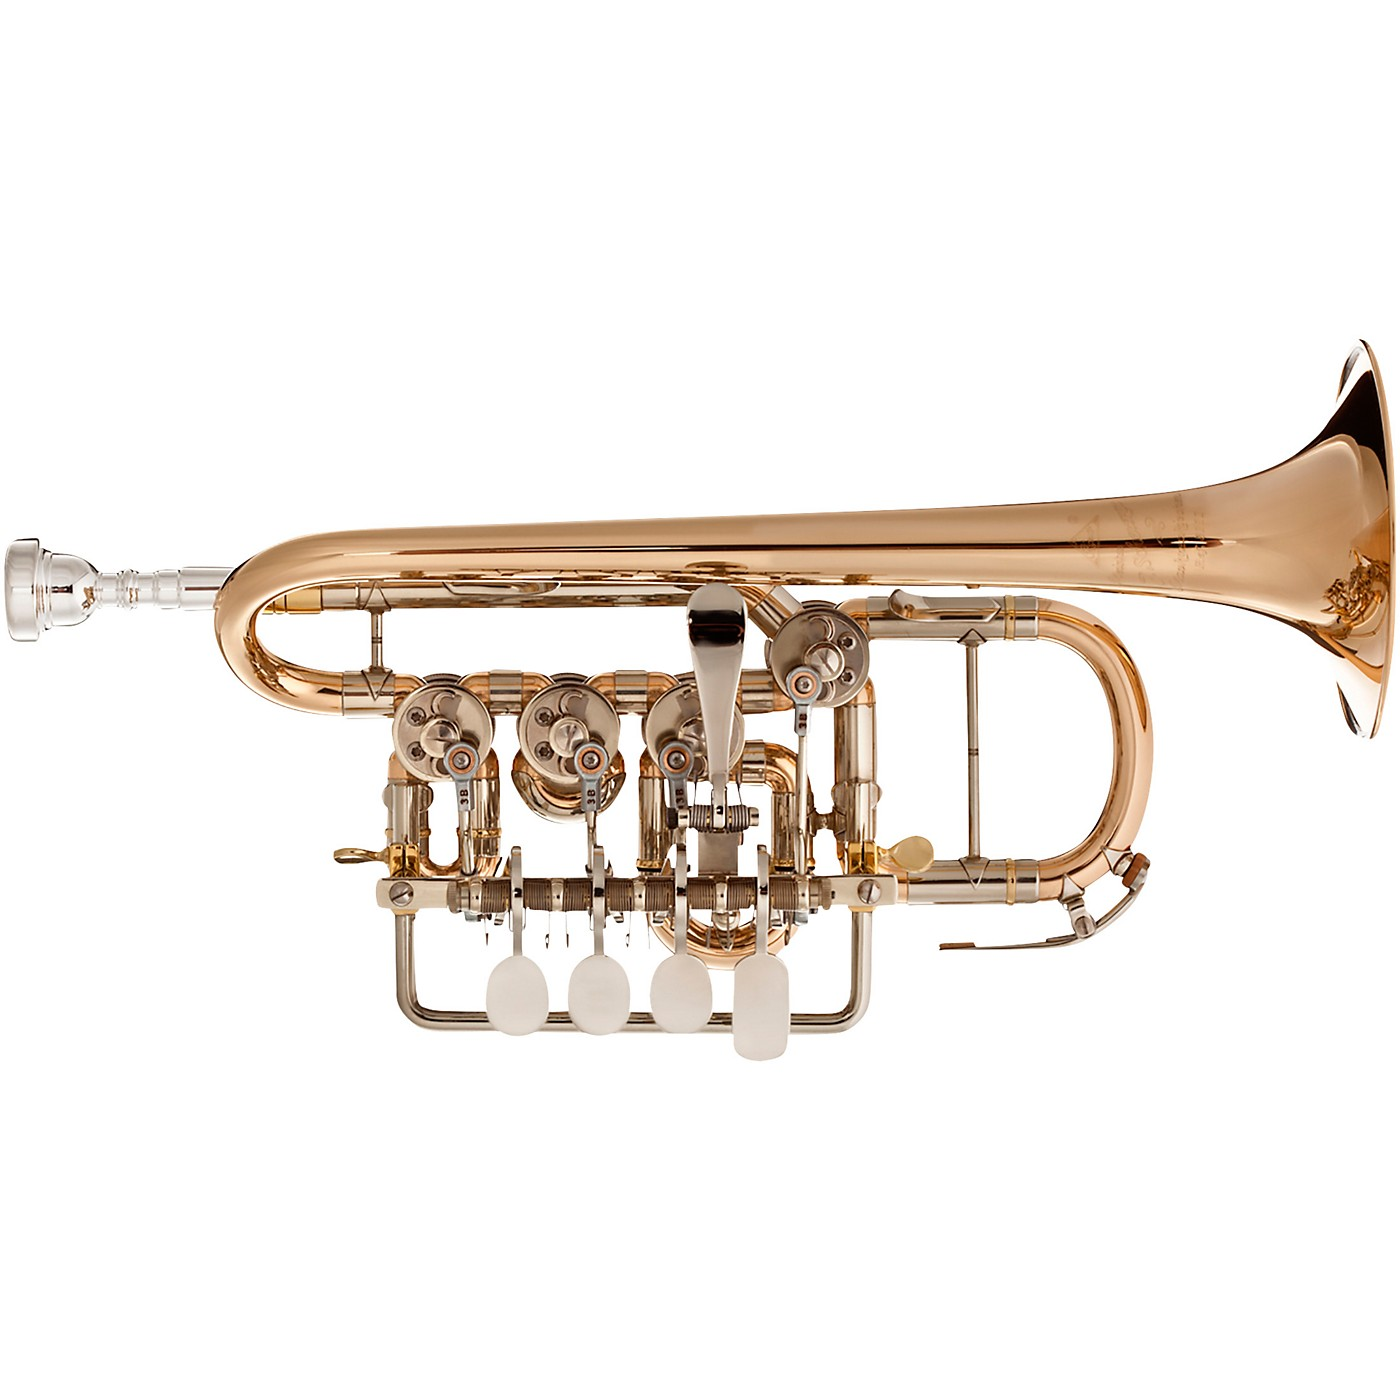 Scherzer Meister Johannes Rotary Valve Piccolo Trumpet thumbnail